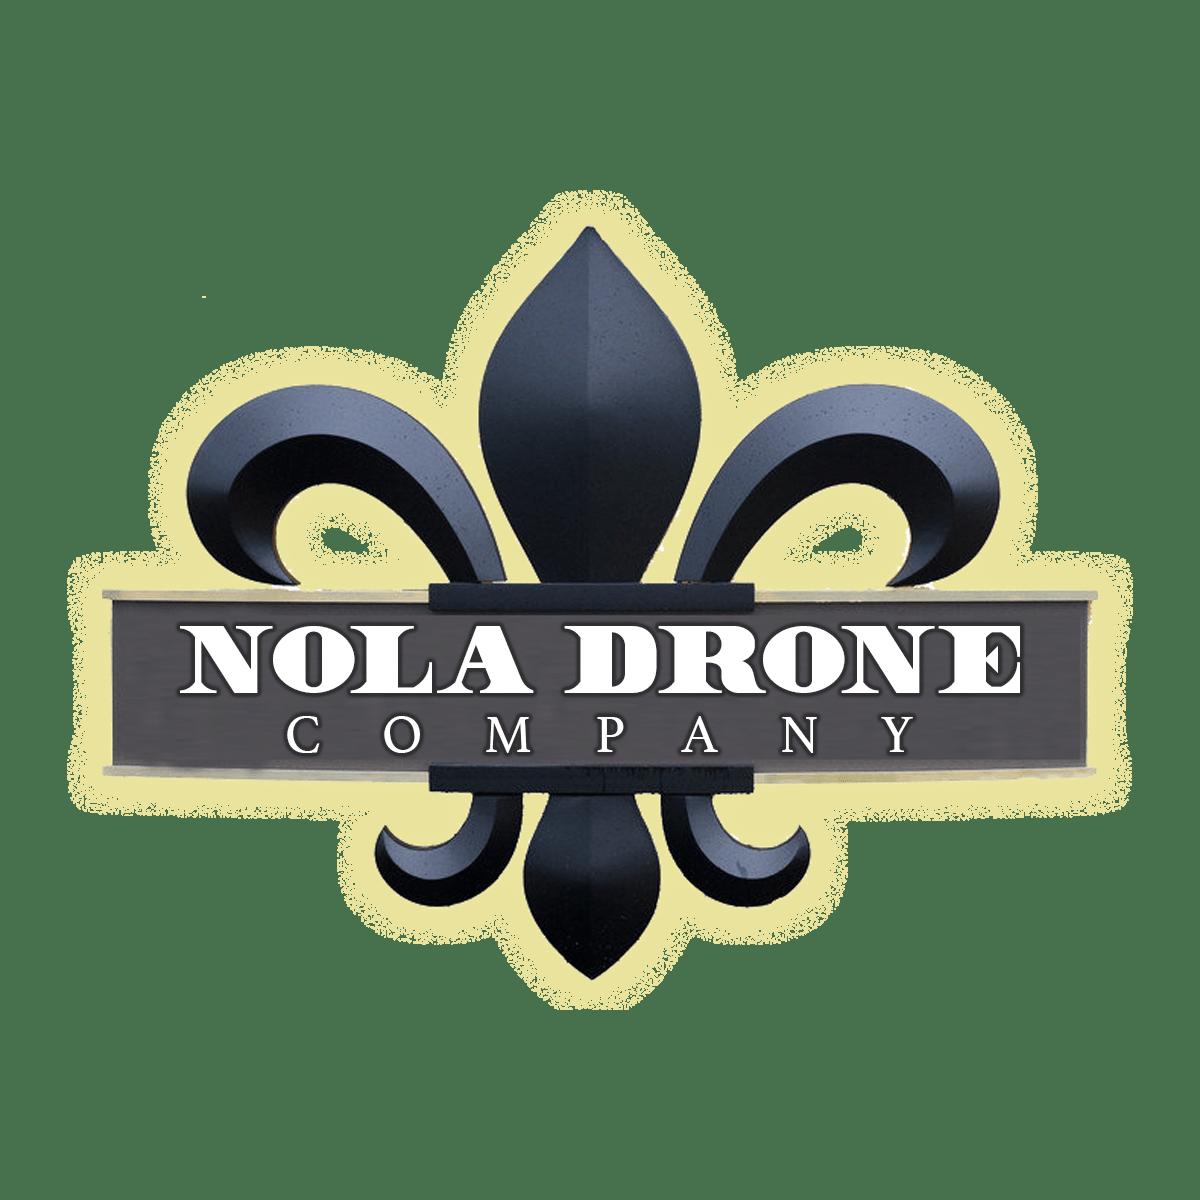 NOLA DRONE COMPANY image